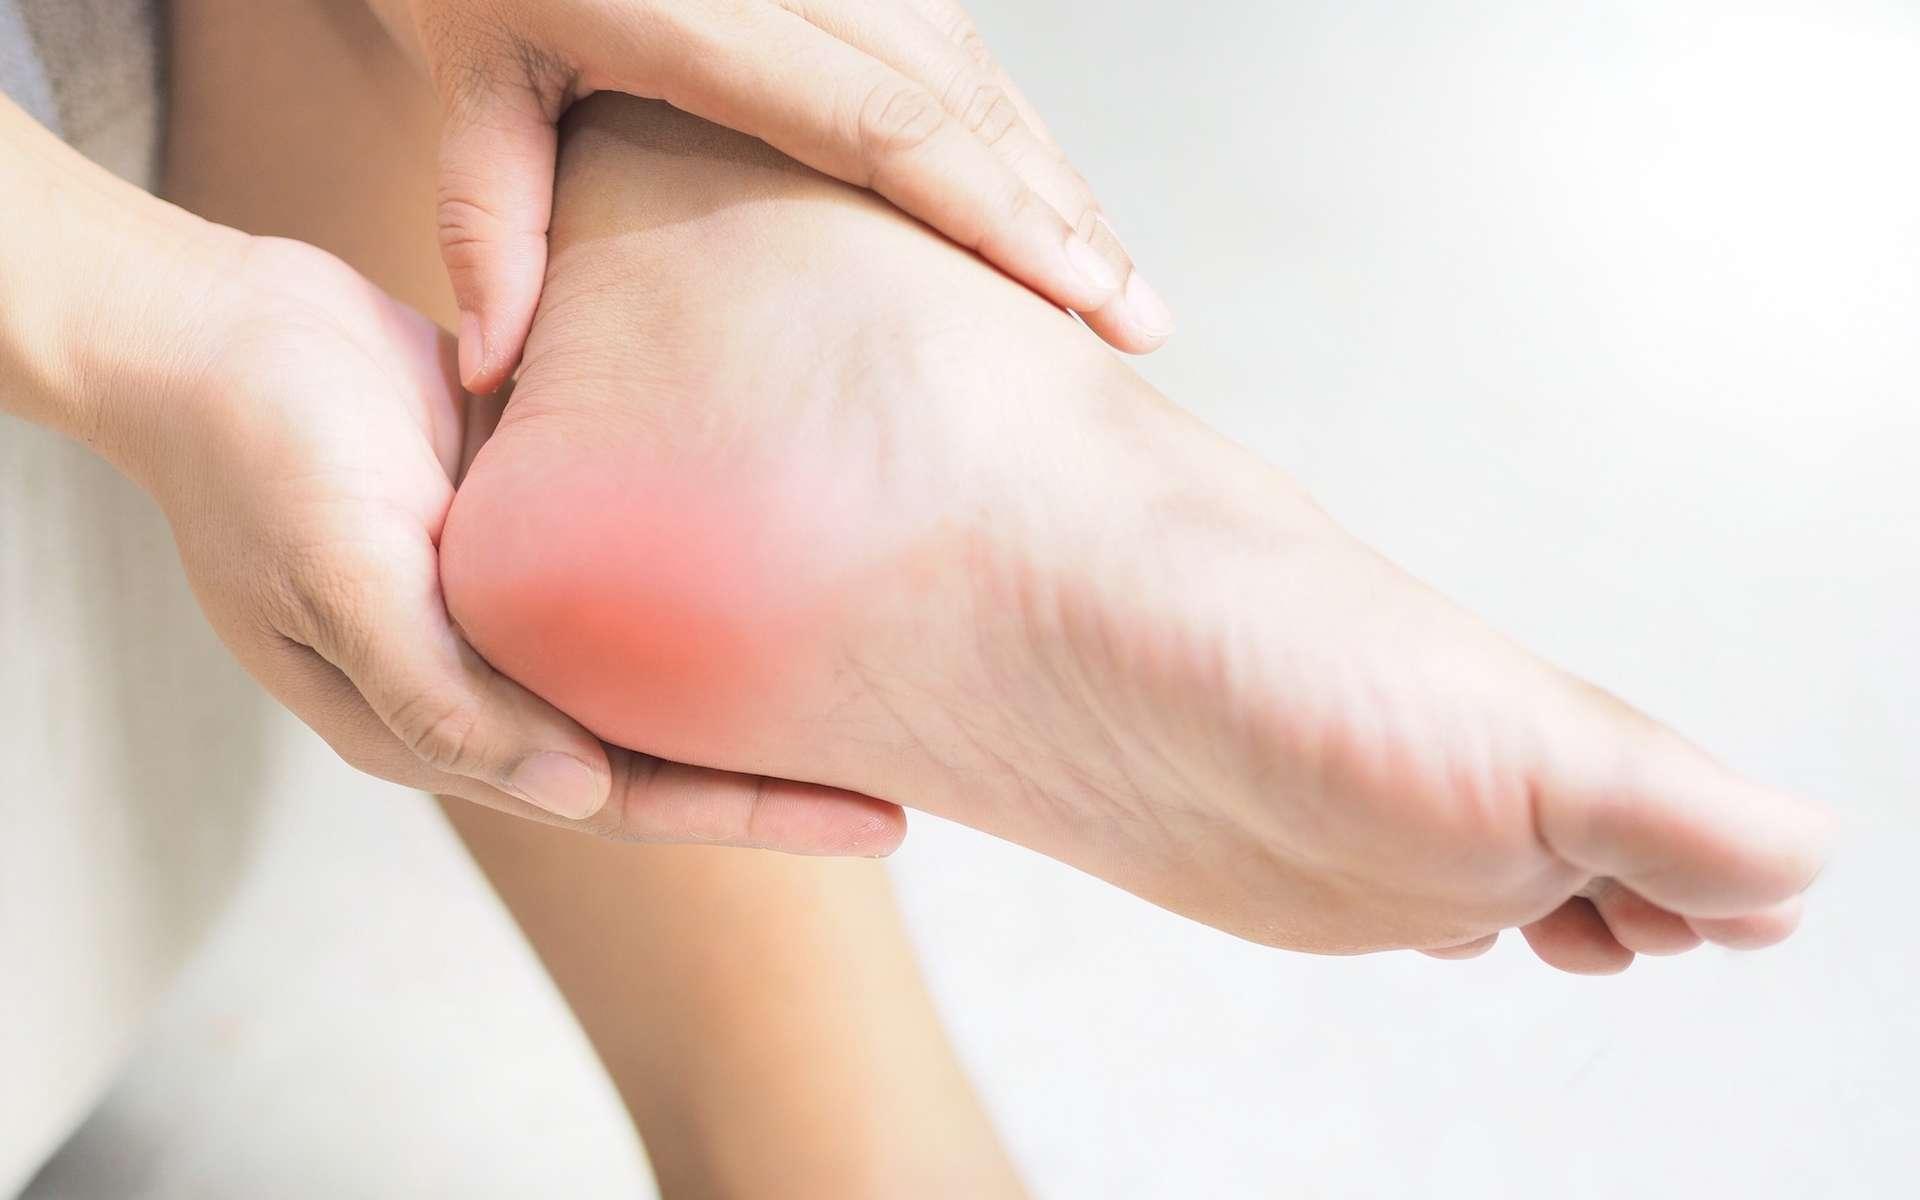 origine de la douleur talon